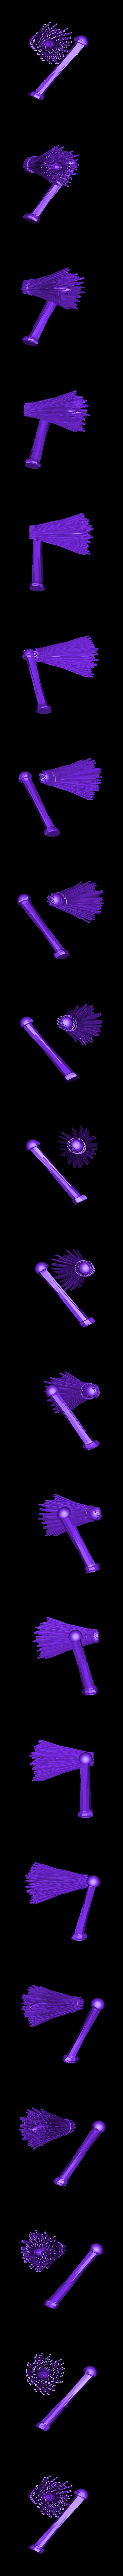 KRAMPUS_stick_2print.stl Download free STL file KRAMPUS Halloween/Xmas decoration R/C controlled (WIP) • Design to 3D print, atarka3